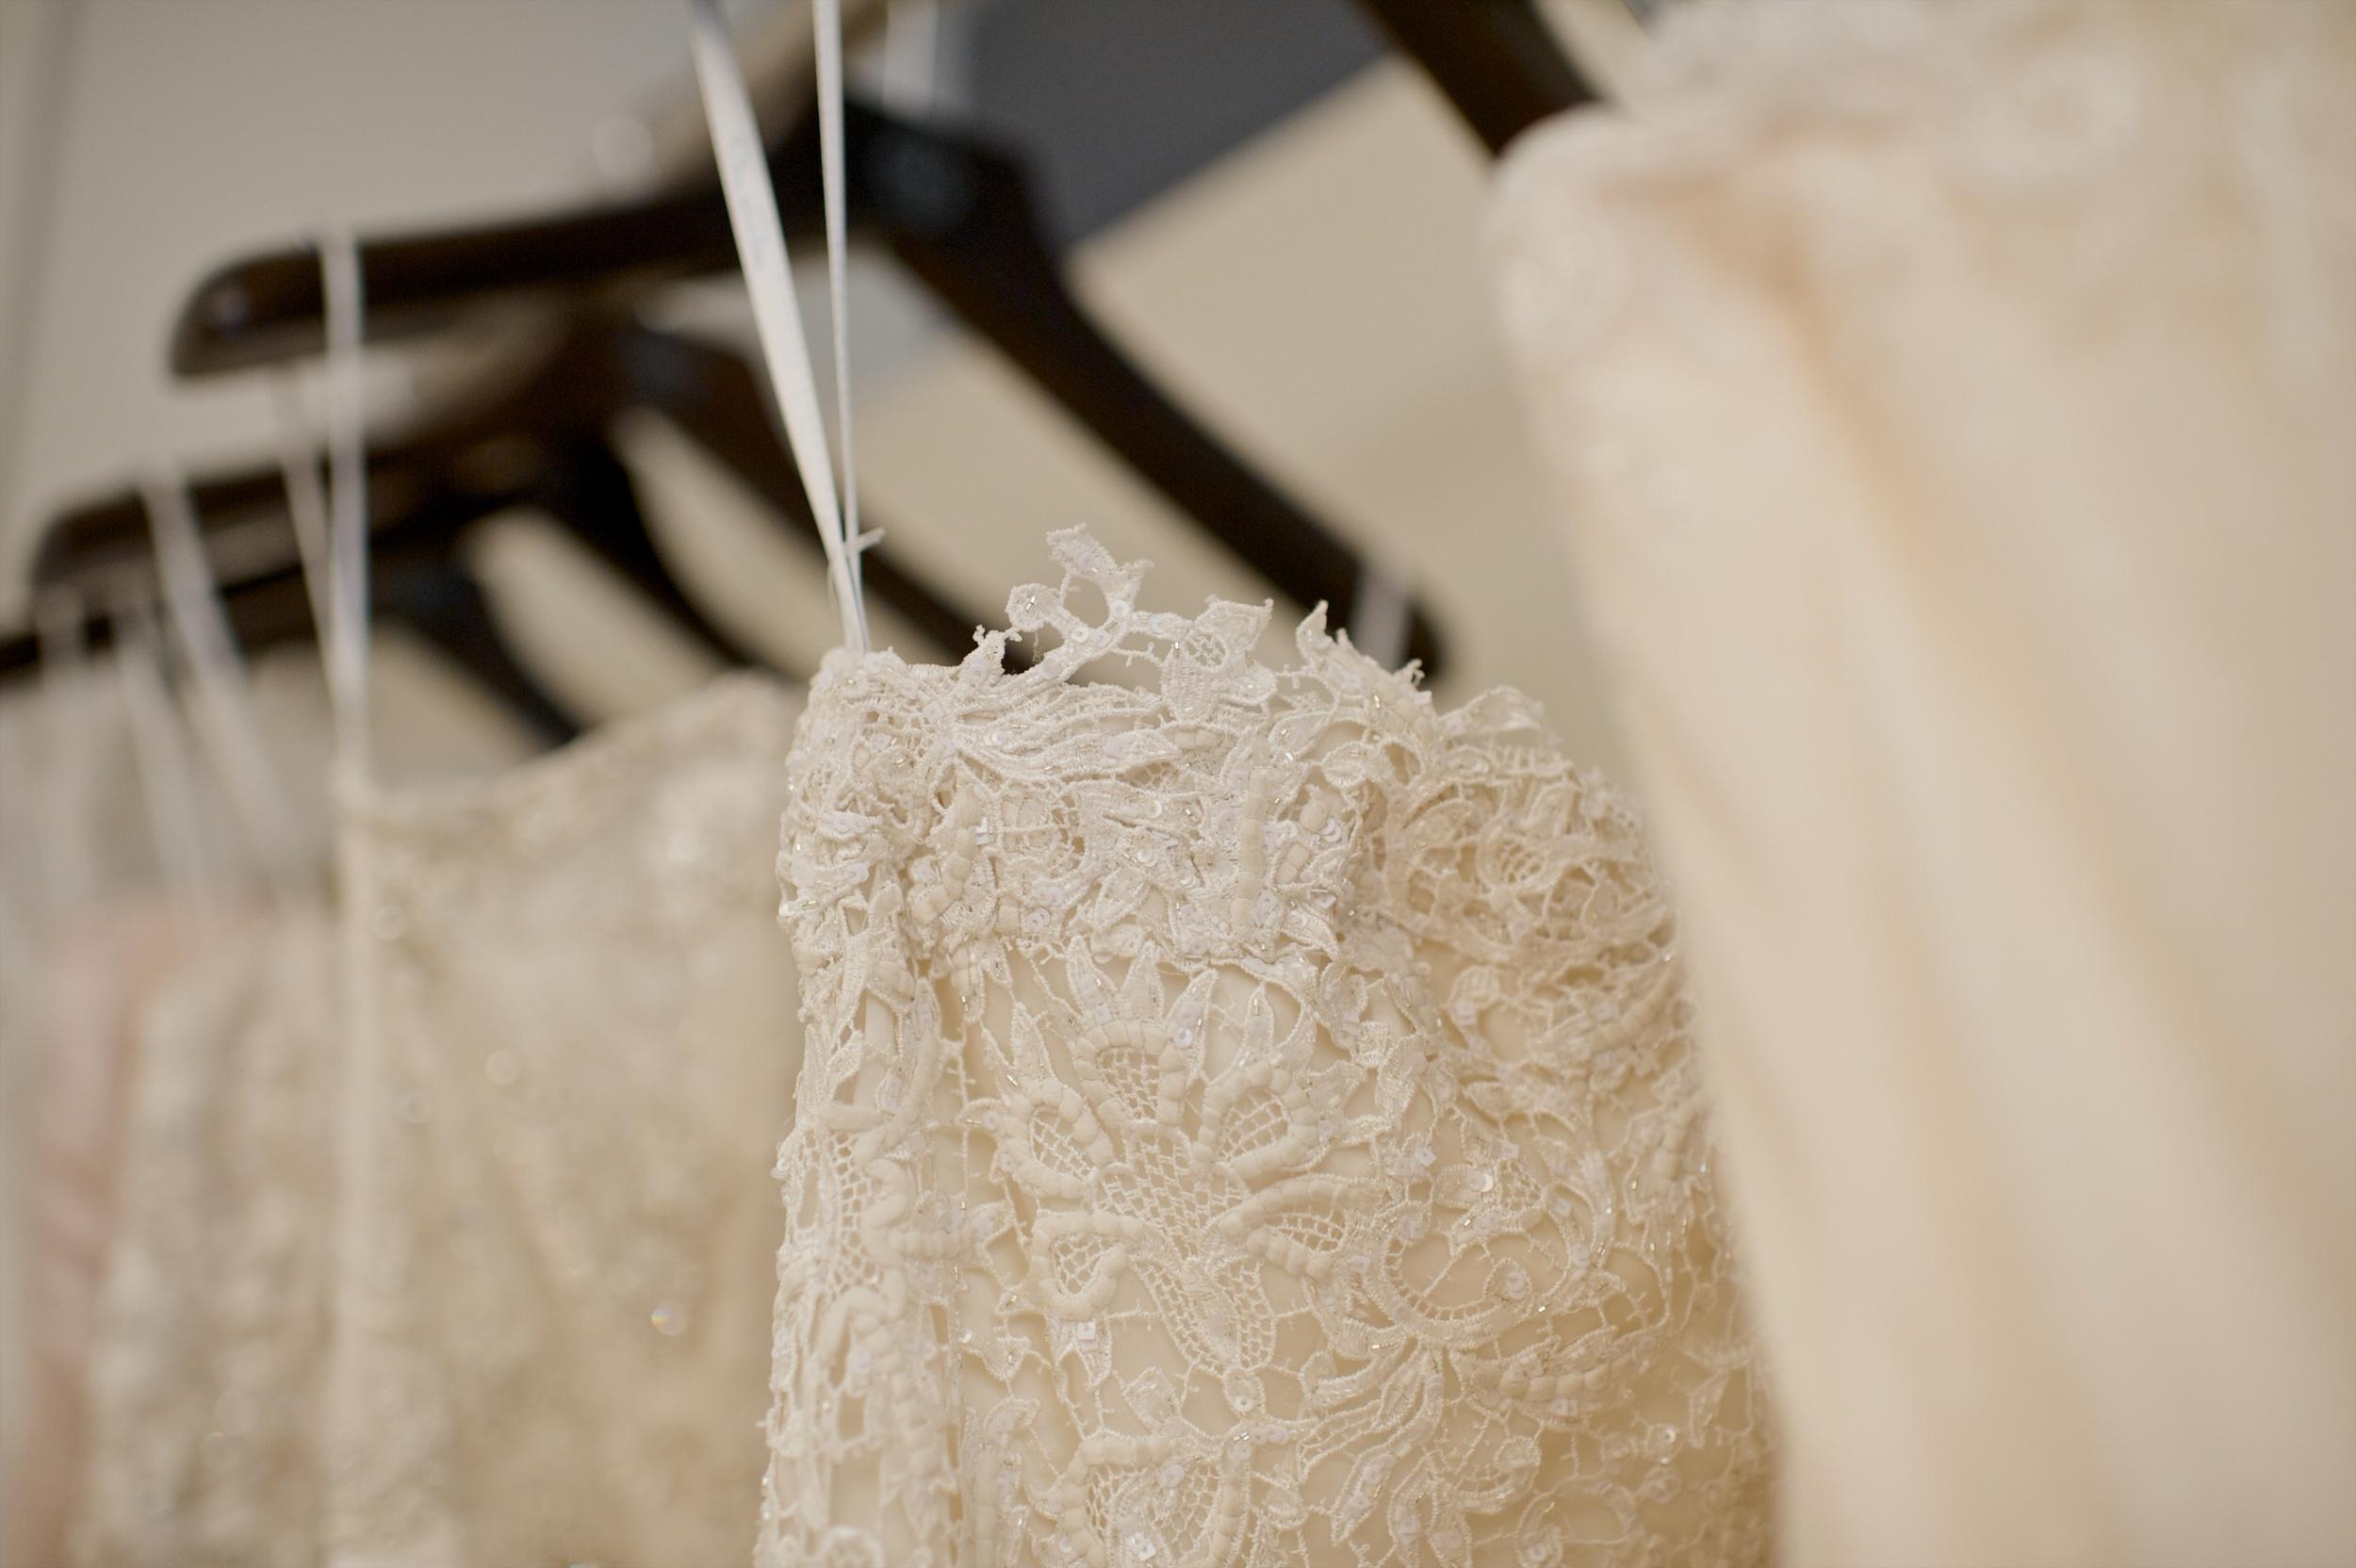 Ceci_New_York_Ceci_Style_Ceci_Johnson_Luxury_Lifestyle_Floral_Lace_Wedding_Letterpress_Inspiration_Design_Custom_Couture_Personalized_Invitations_3.jpg